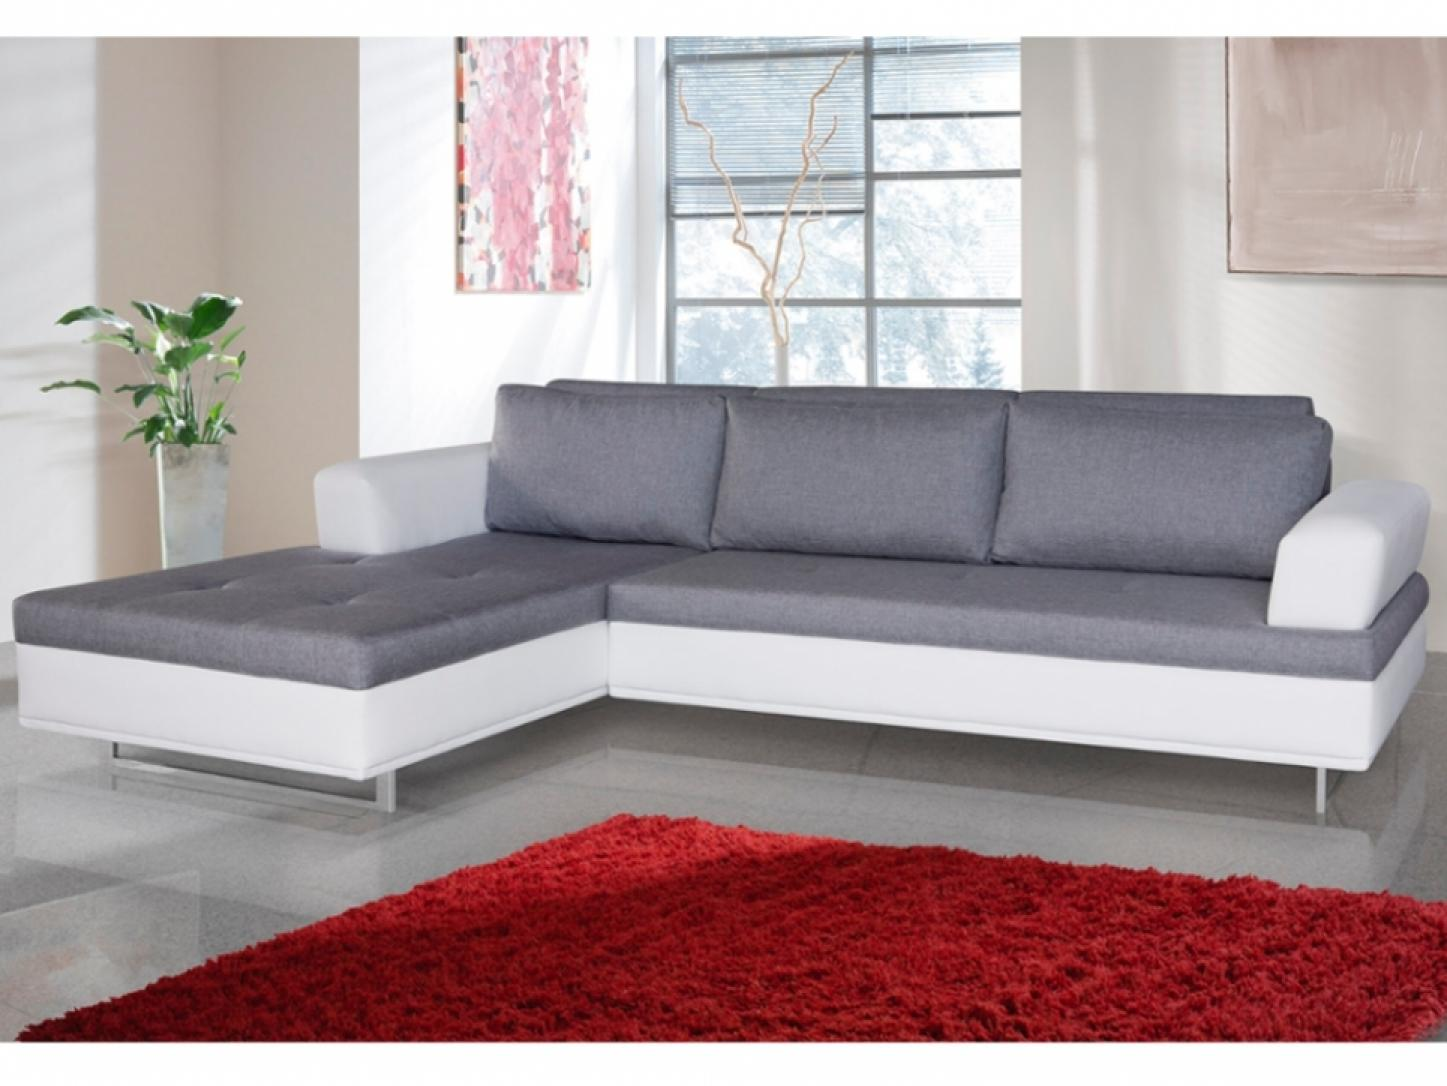 photos canap d 39 angle convertible gris et blanc. Black Bedroom Furniture Sets. Home Design Ideas